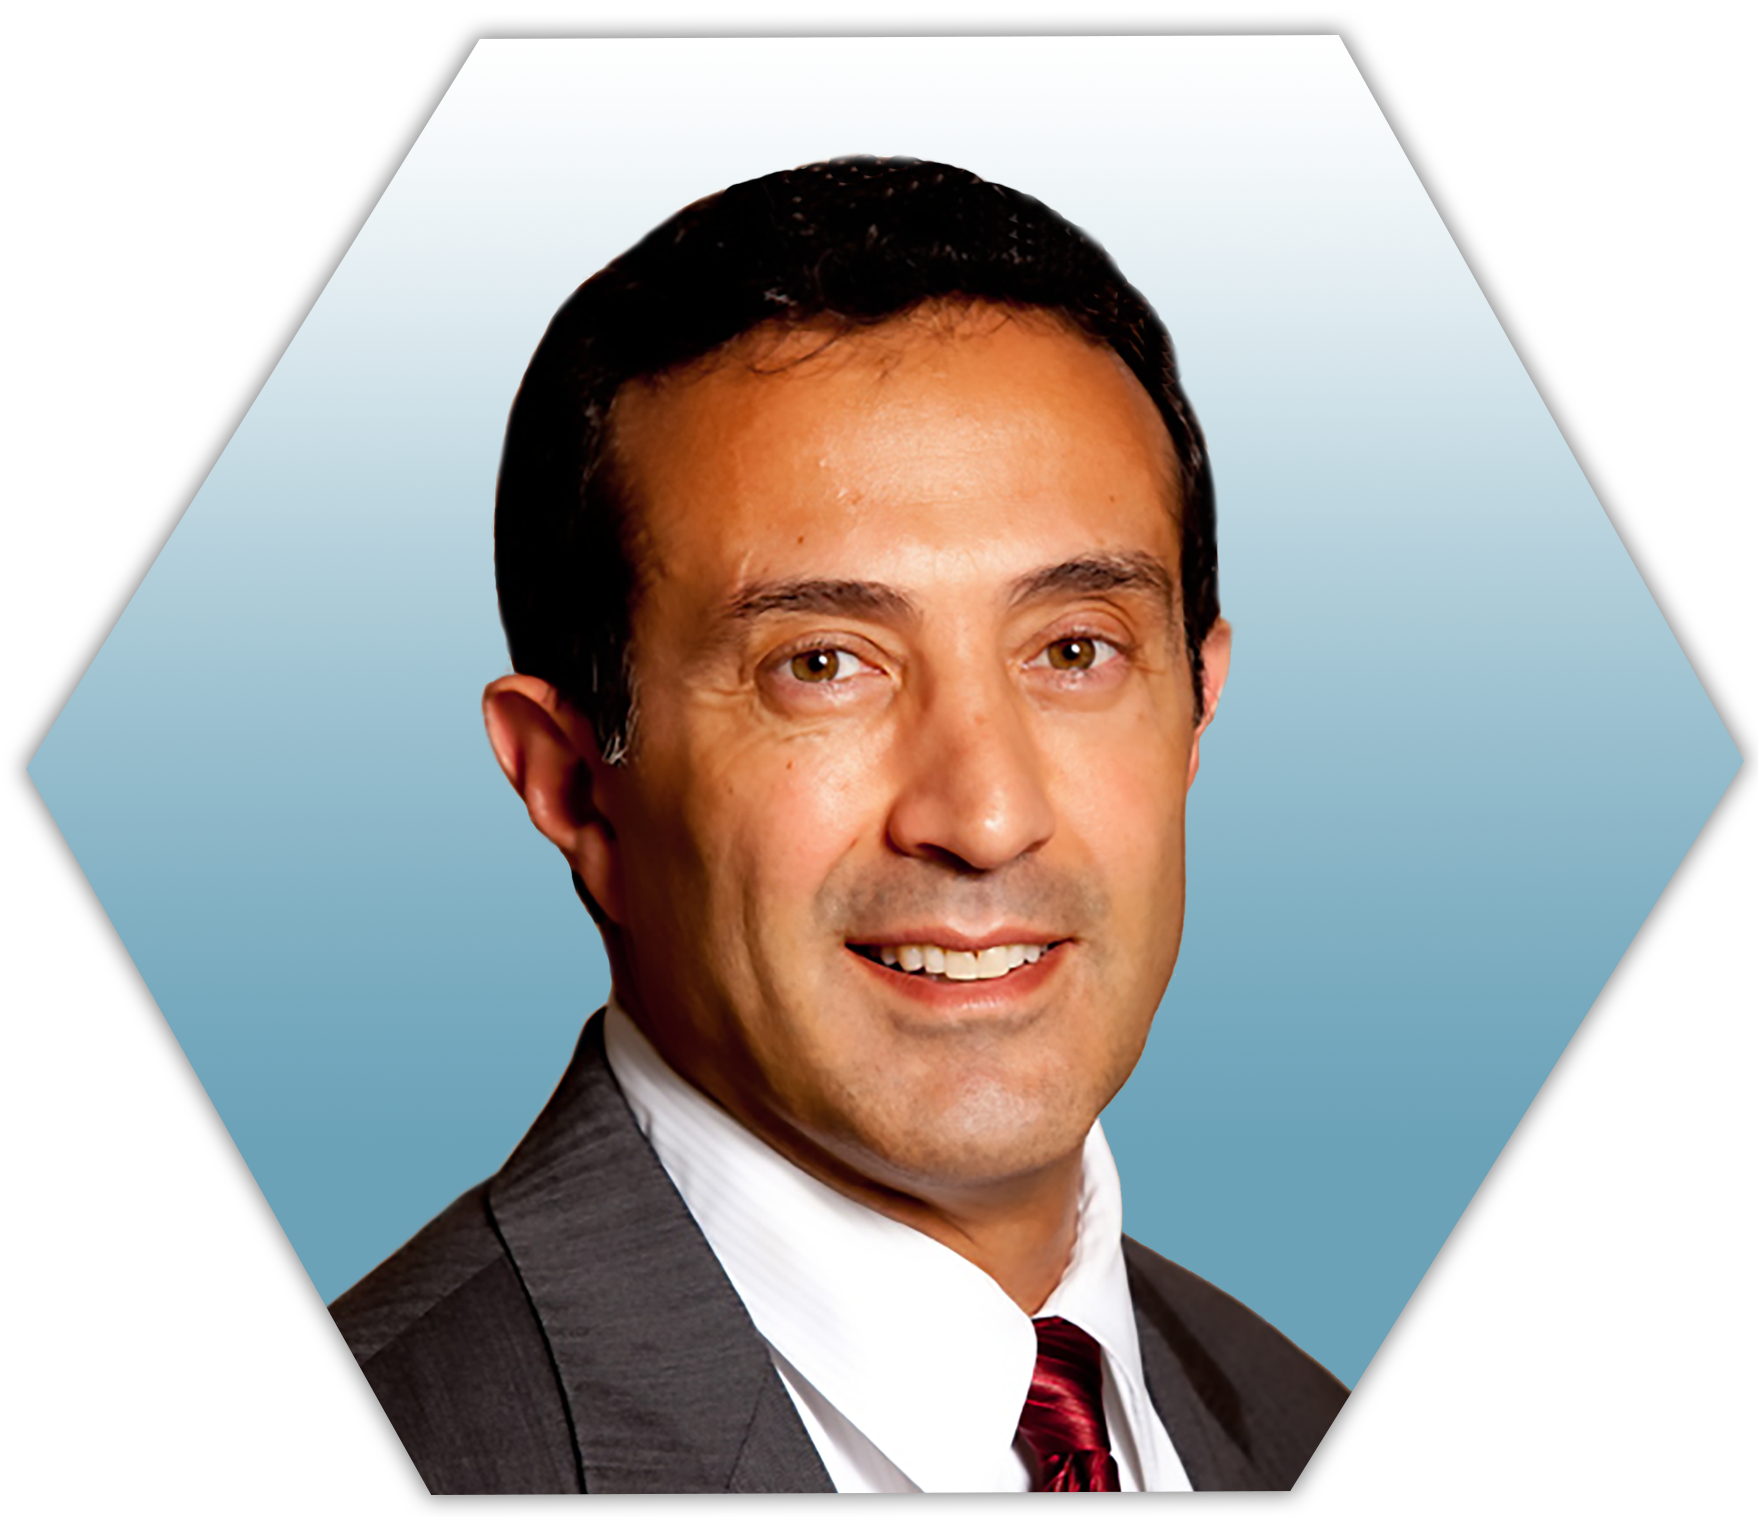 Omar%20Karame,%20Chief%20Financial%20Officer Leadership Team